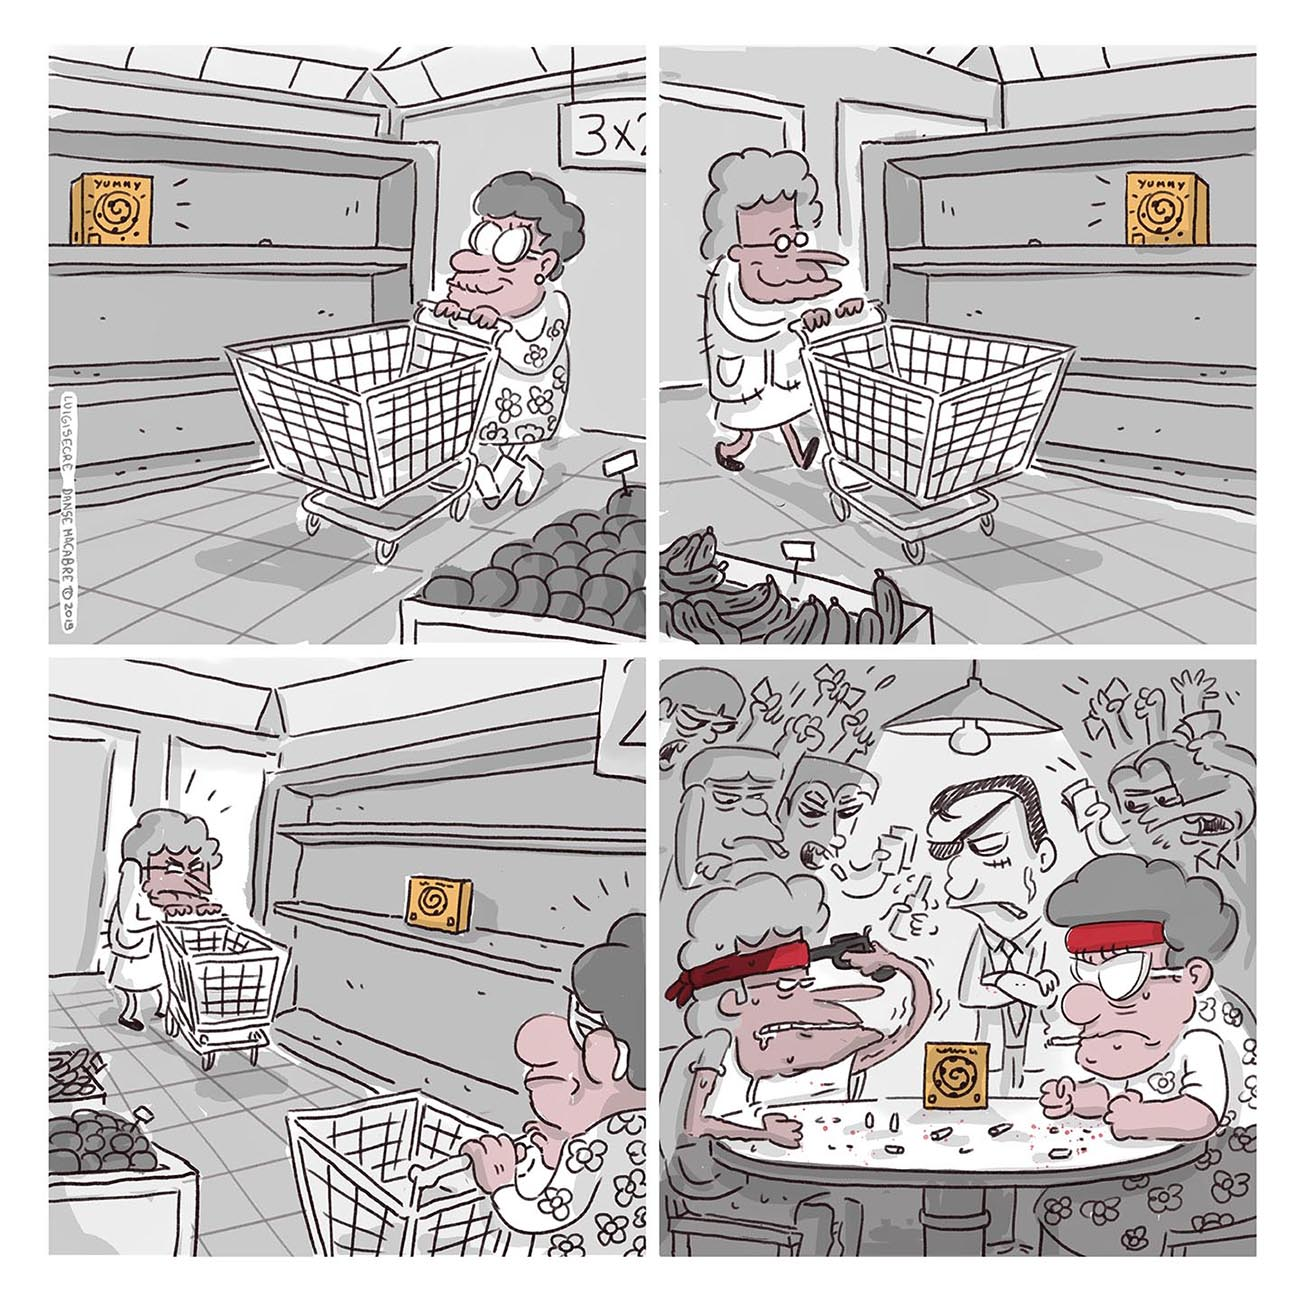 Contenuti_Low_Res_Luigi_Segre_Cartoons_2019_Danse_Macabre_05.jpg